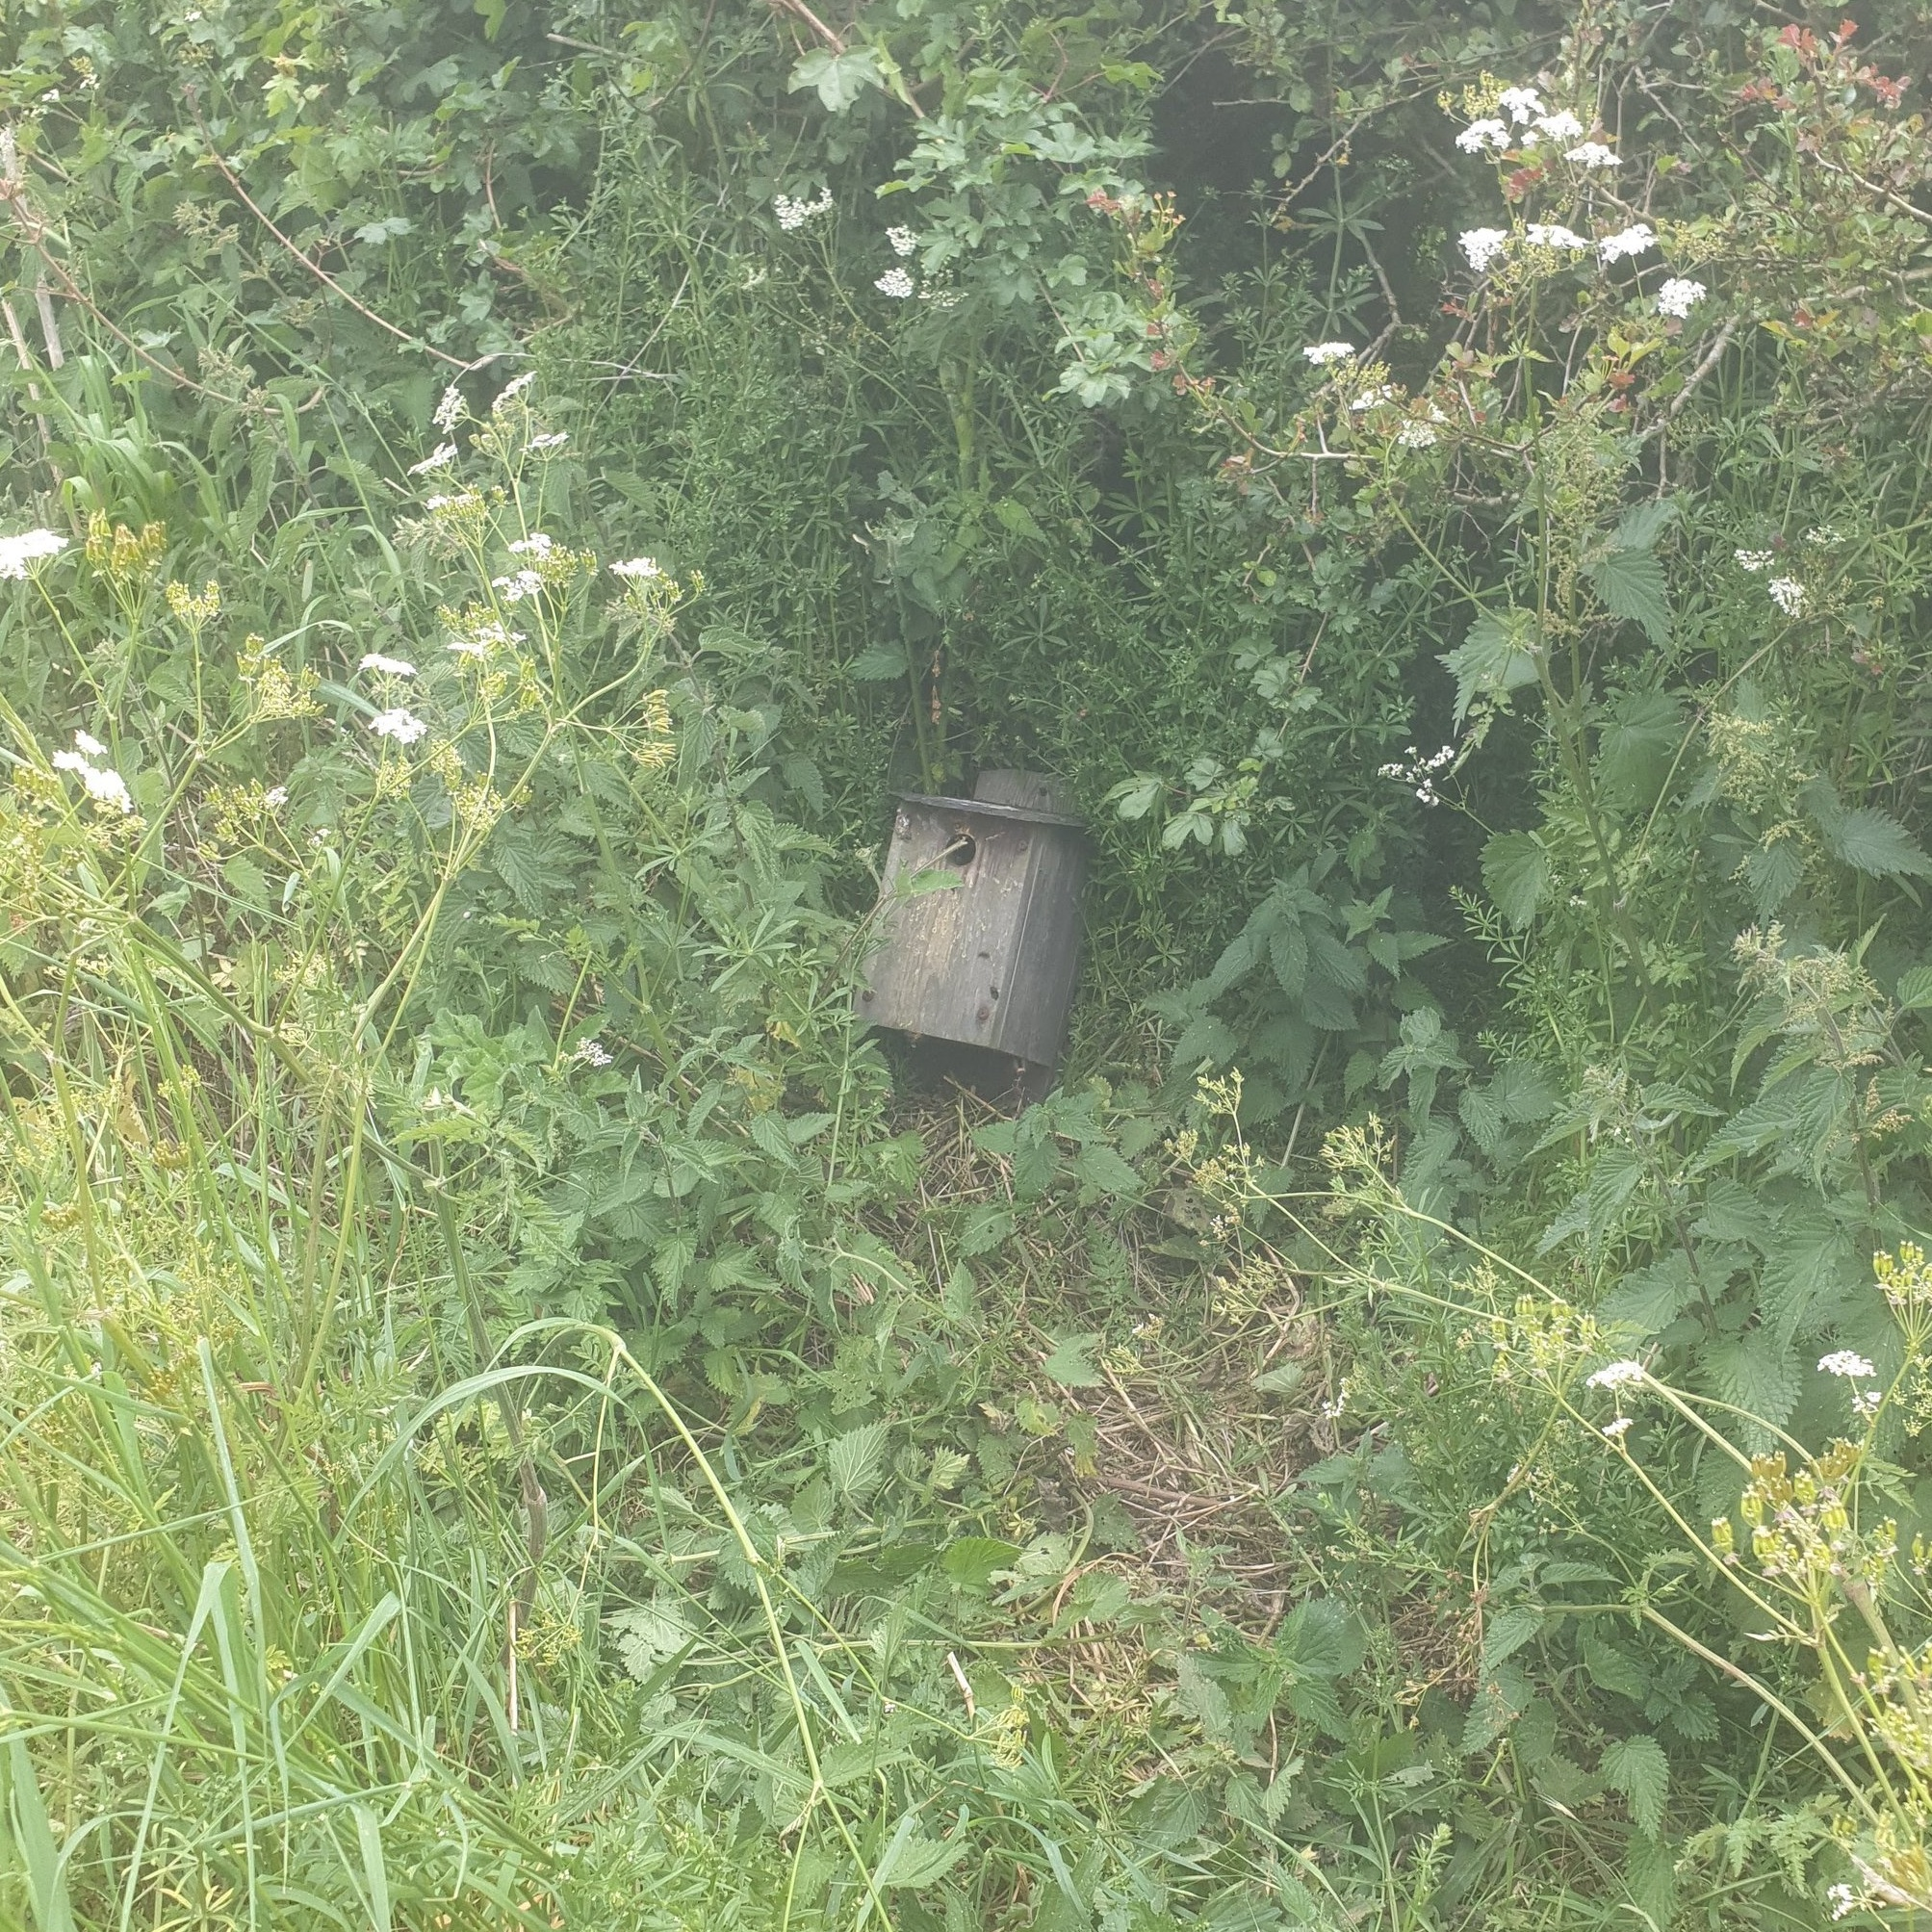 Relocated bee nest